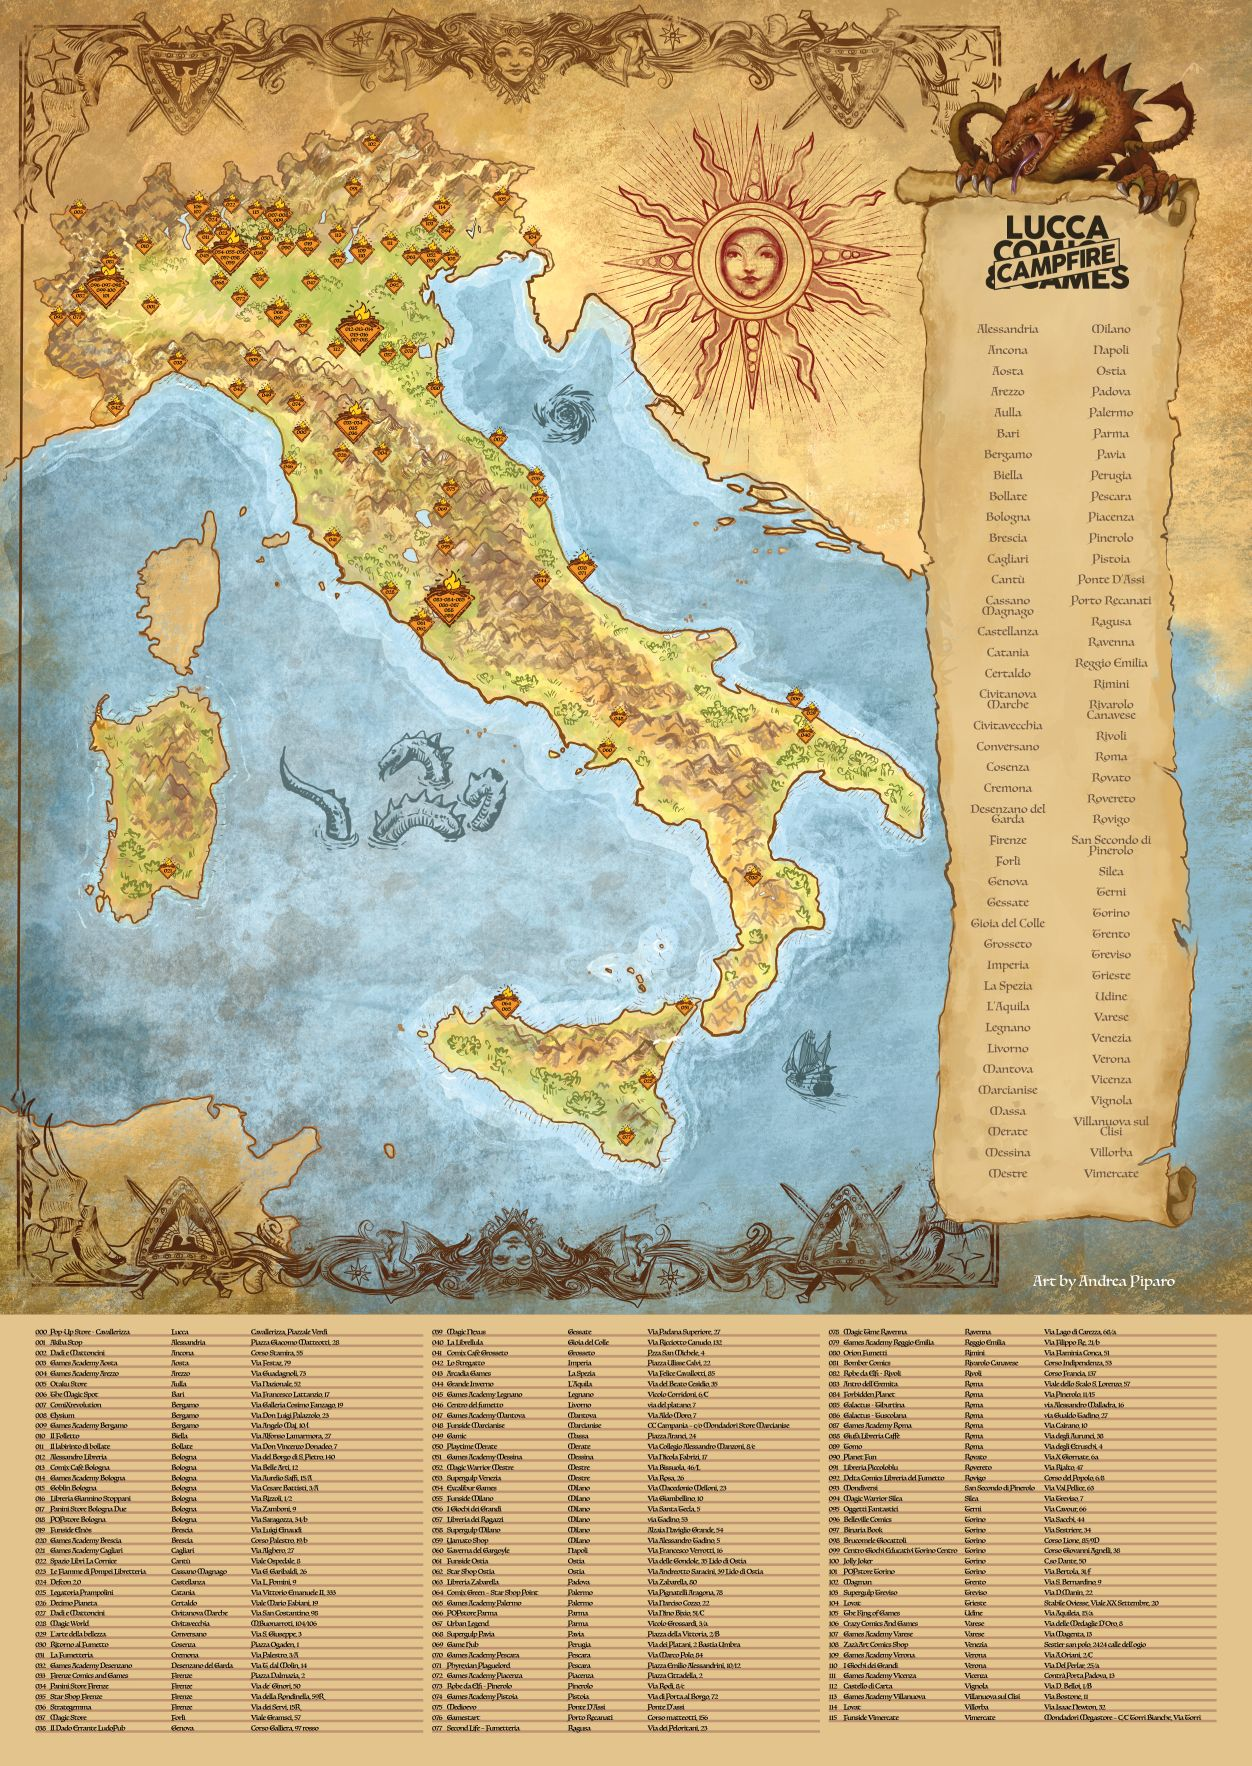 Lucca Comica&Games 2020 Campfire lista